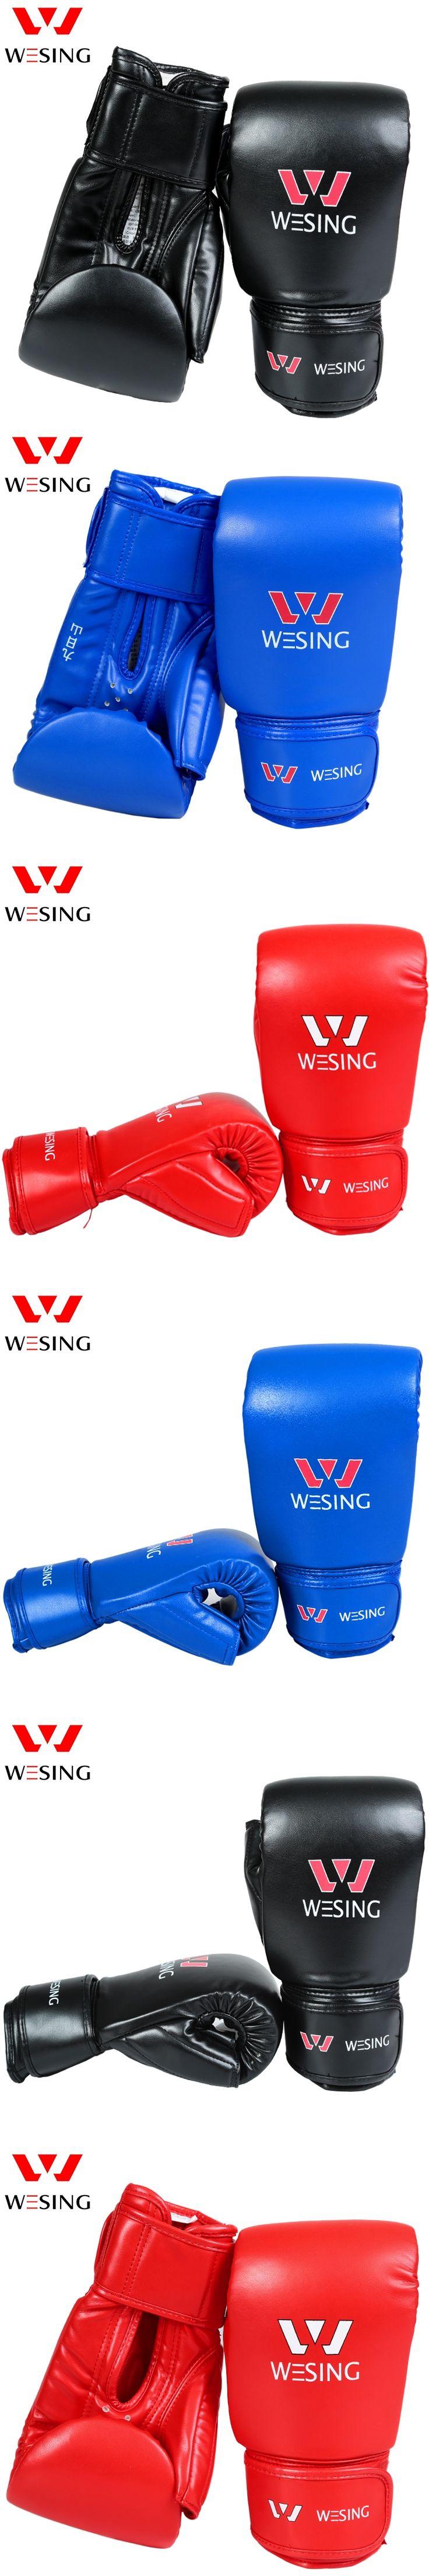 MMA gloves punch bag gloves  for punch sandbag  kick boxing muay thai training